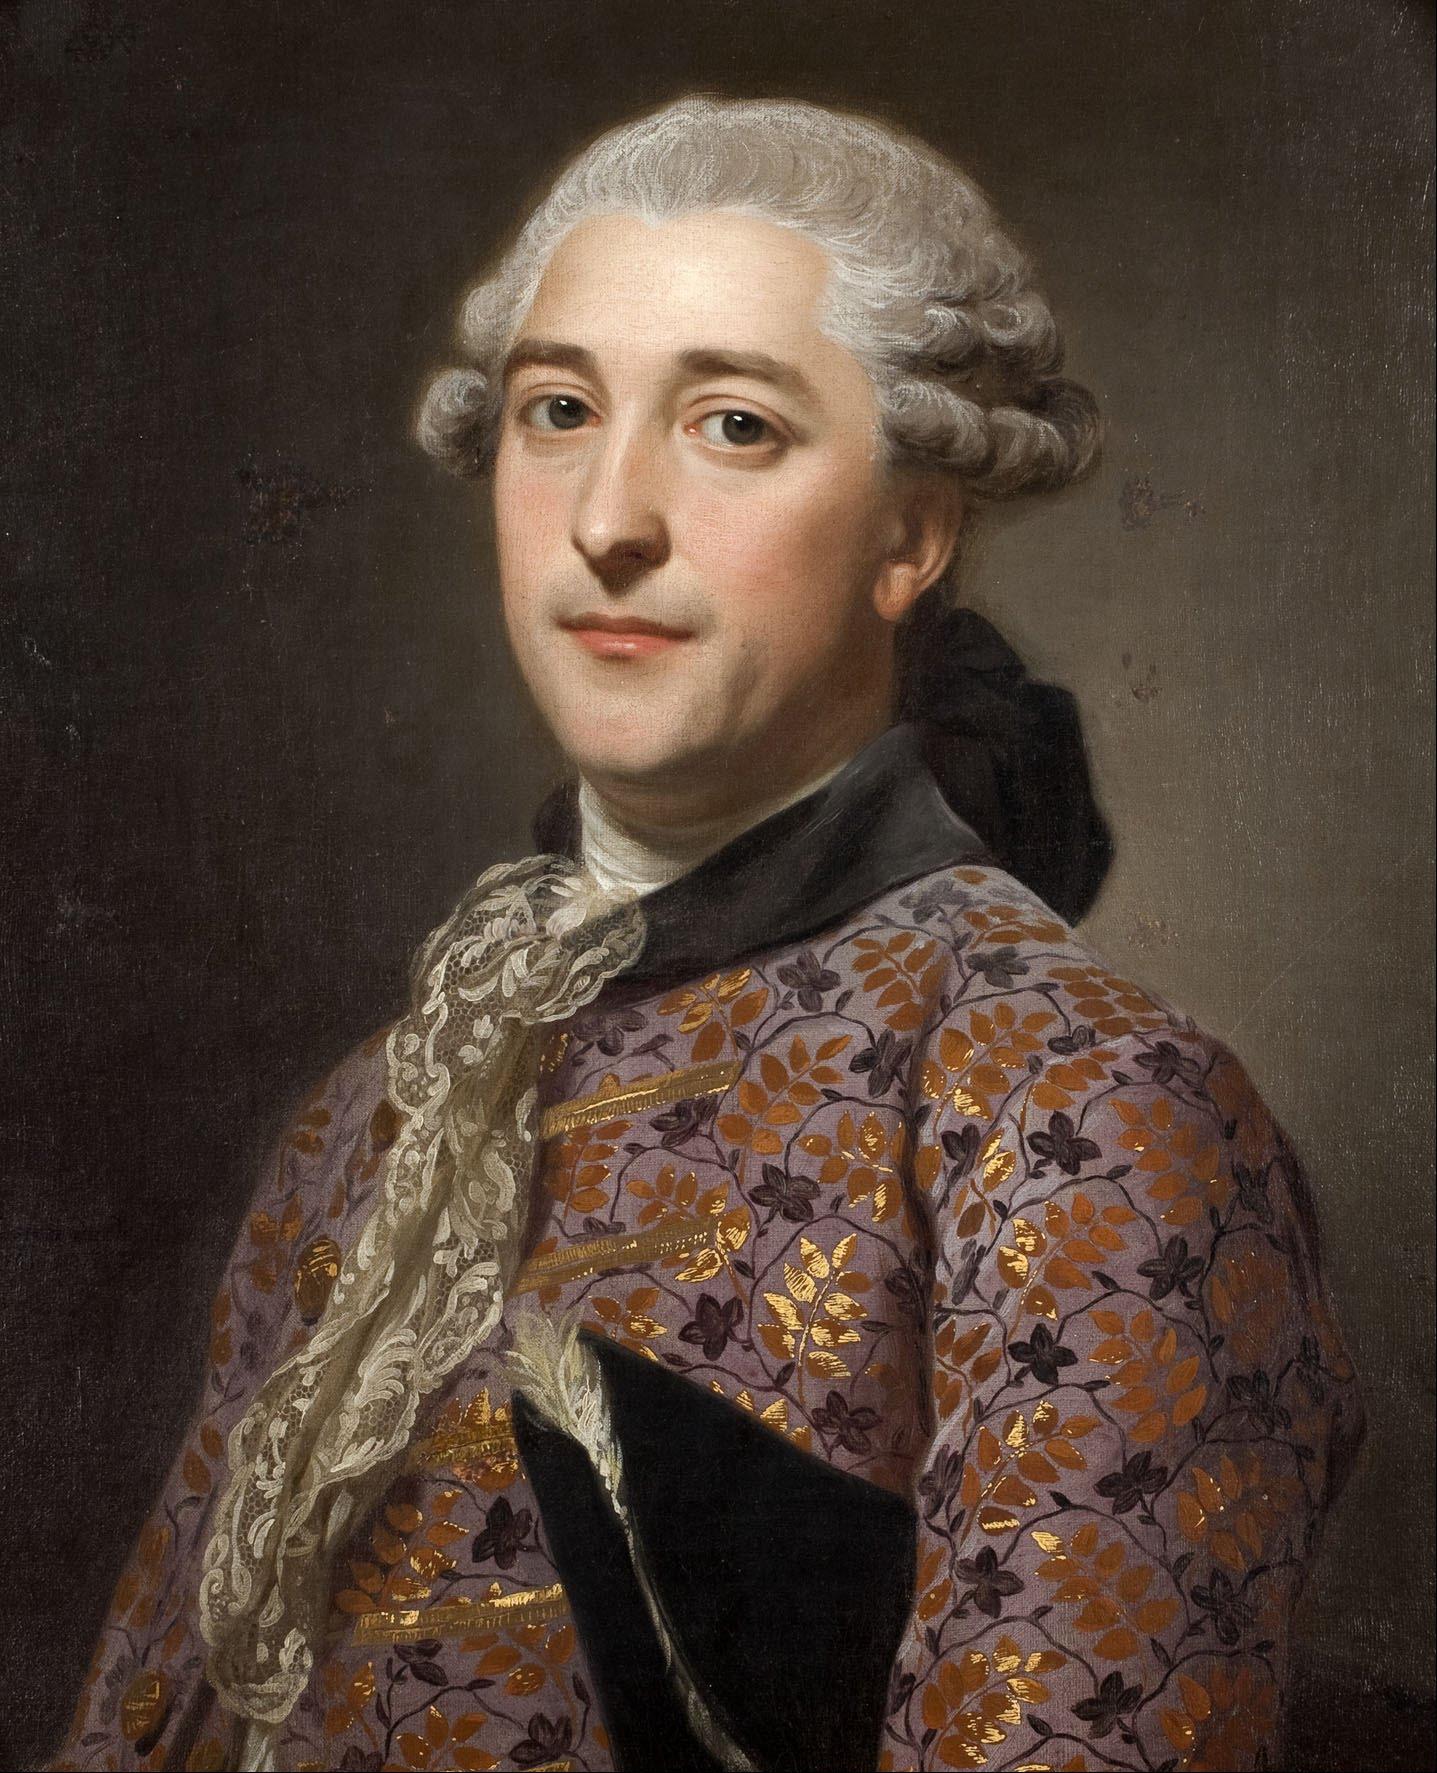 Alexander_Roslin_-_Portrait_of_Prince_Vladimir_Golitsyn_Borisovtj_-_Google_Art_Project